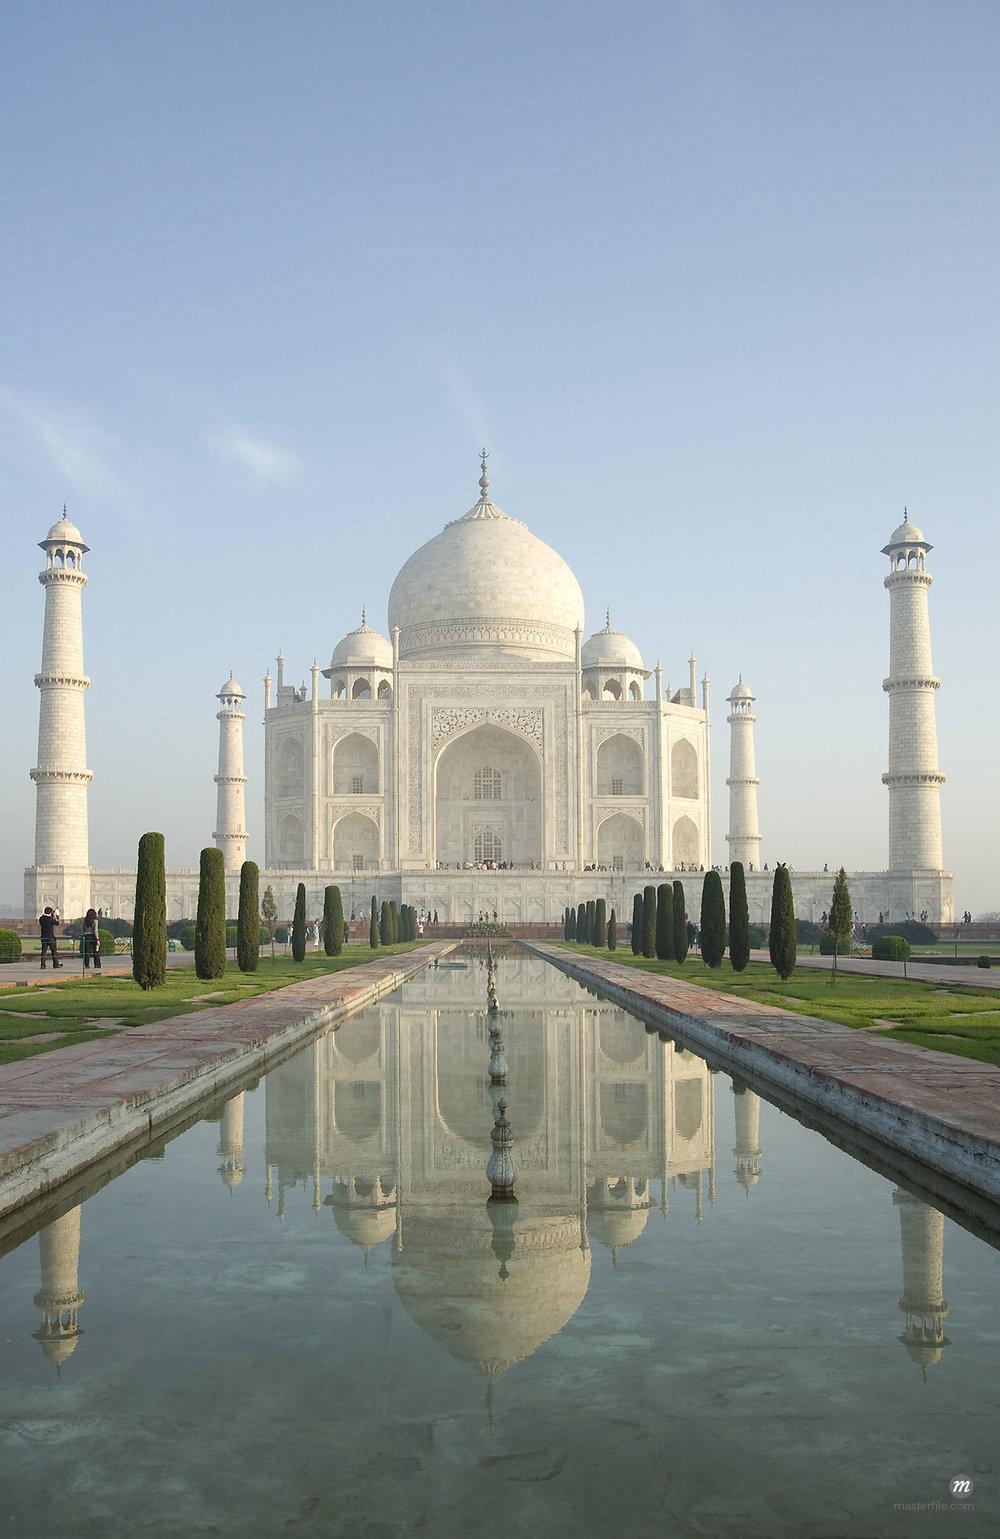 Taj Mahal © Robert Harding Images / Masterfile